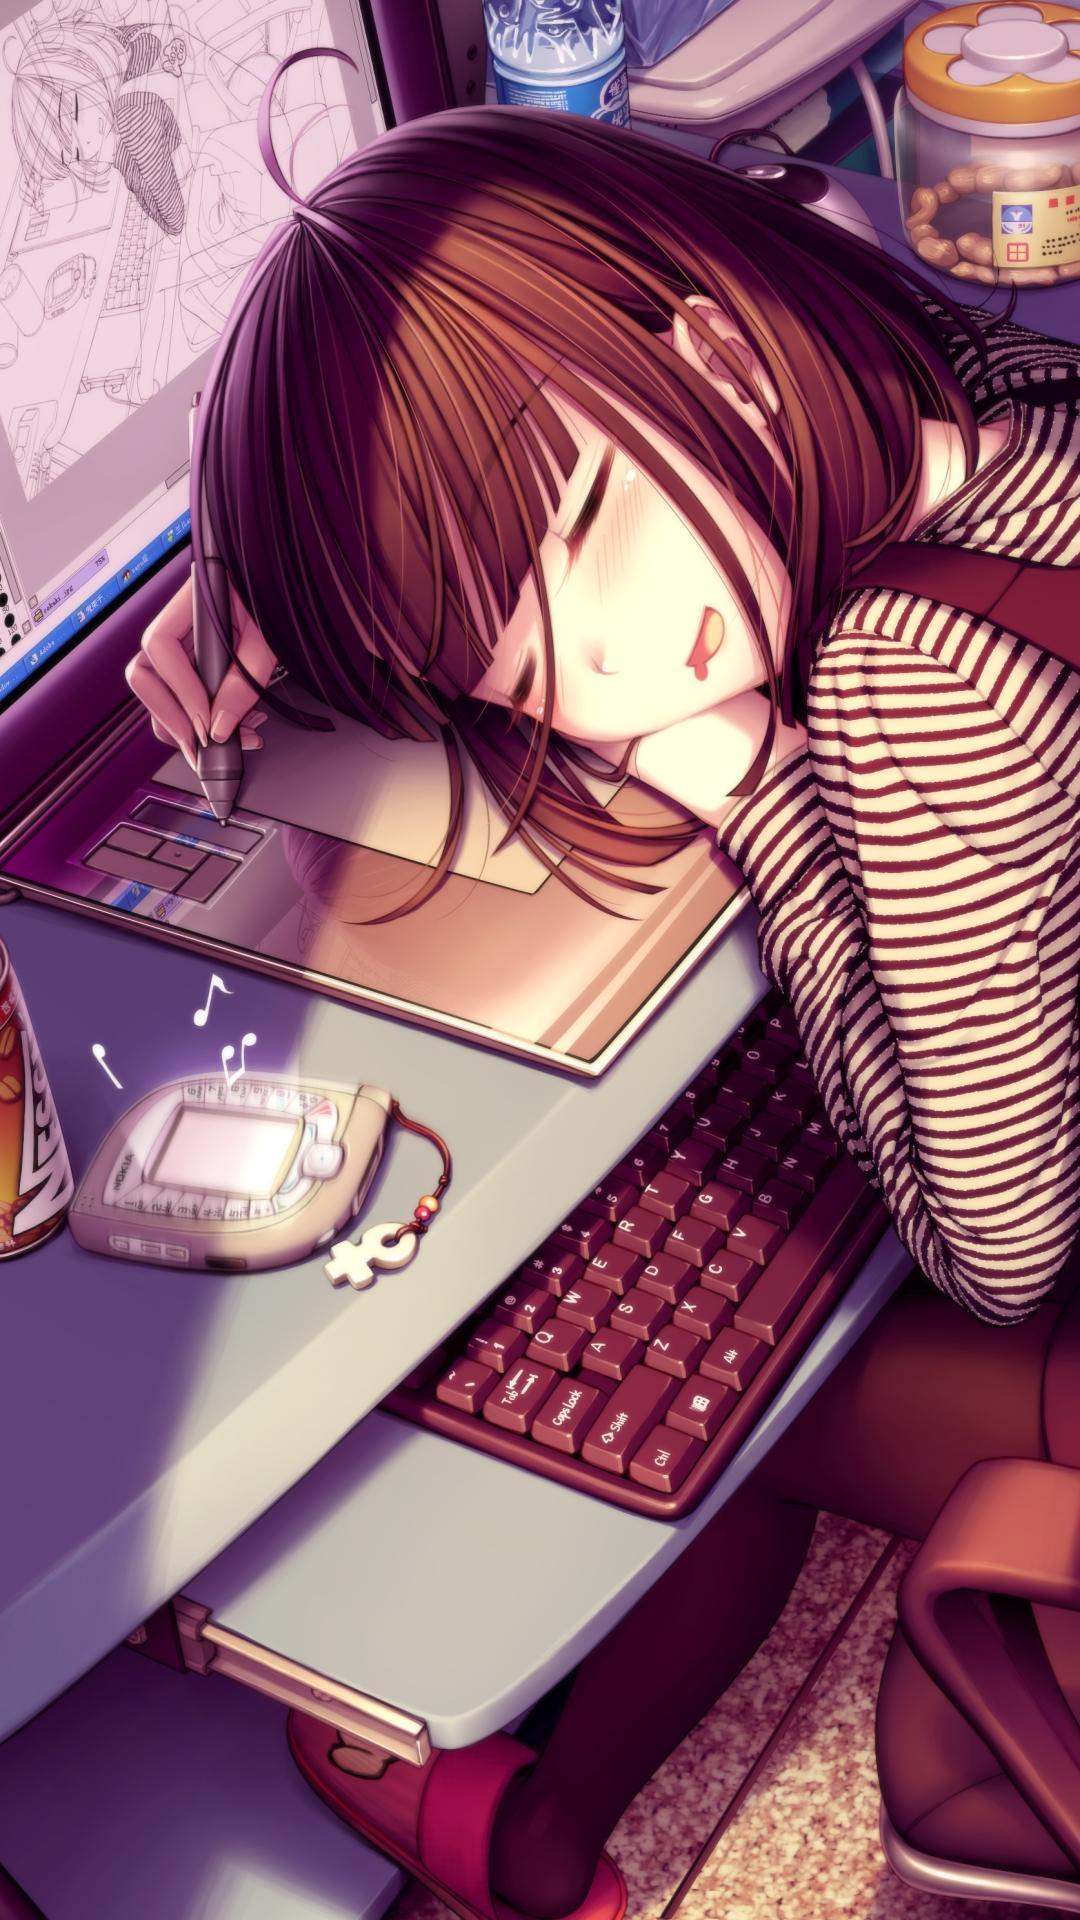 Anime Girl 4k Phone Wallpapers - Wallpaper Cave